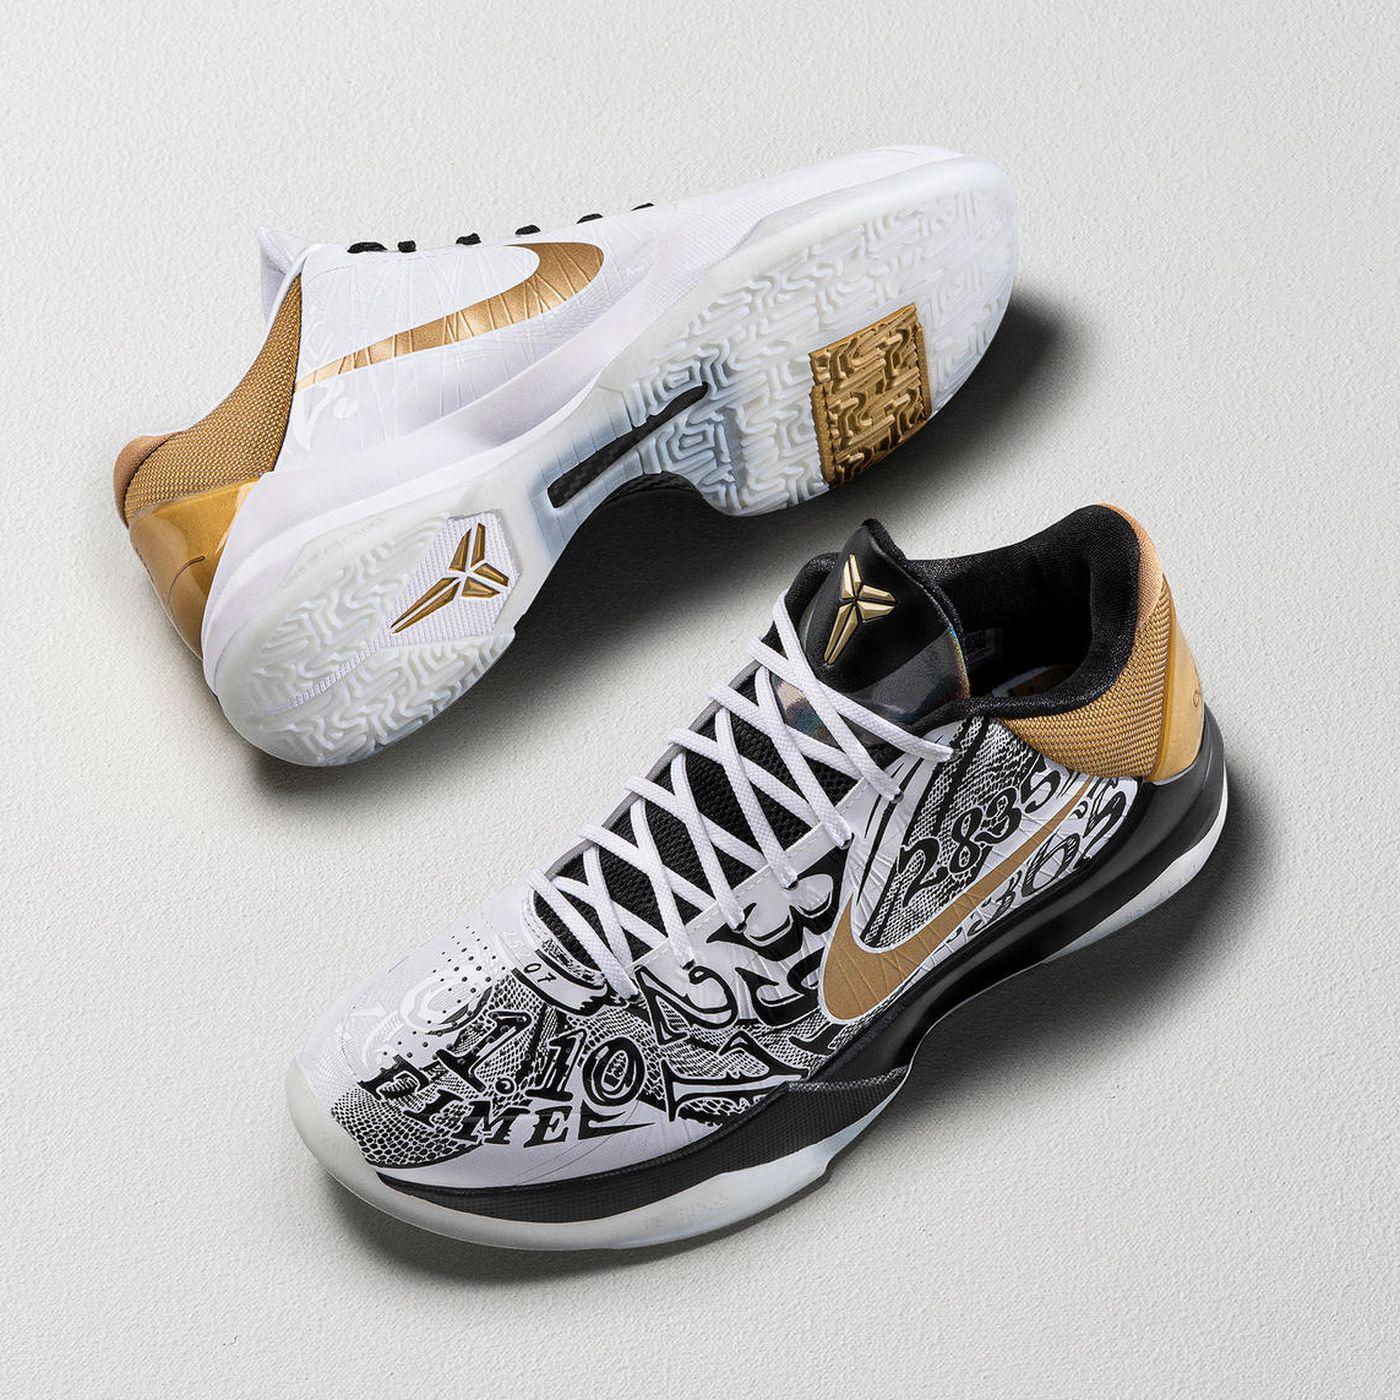 Nike to drop new Kobe protro colorways for Kobe's birthday, Mamba ...